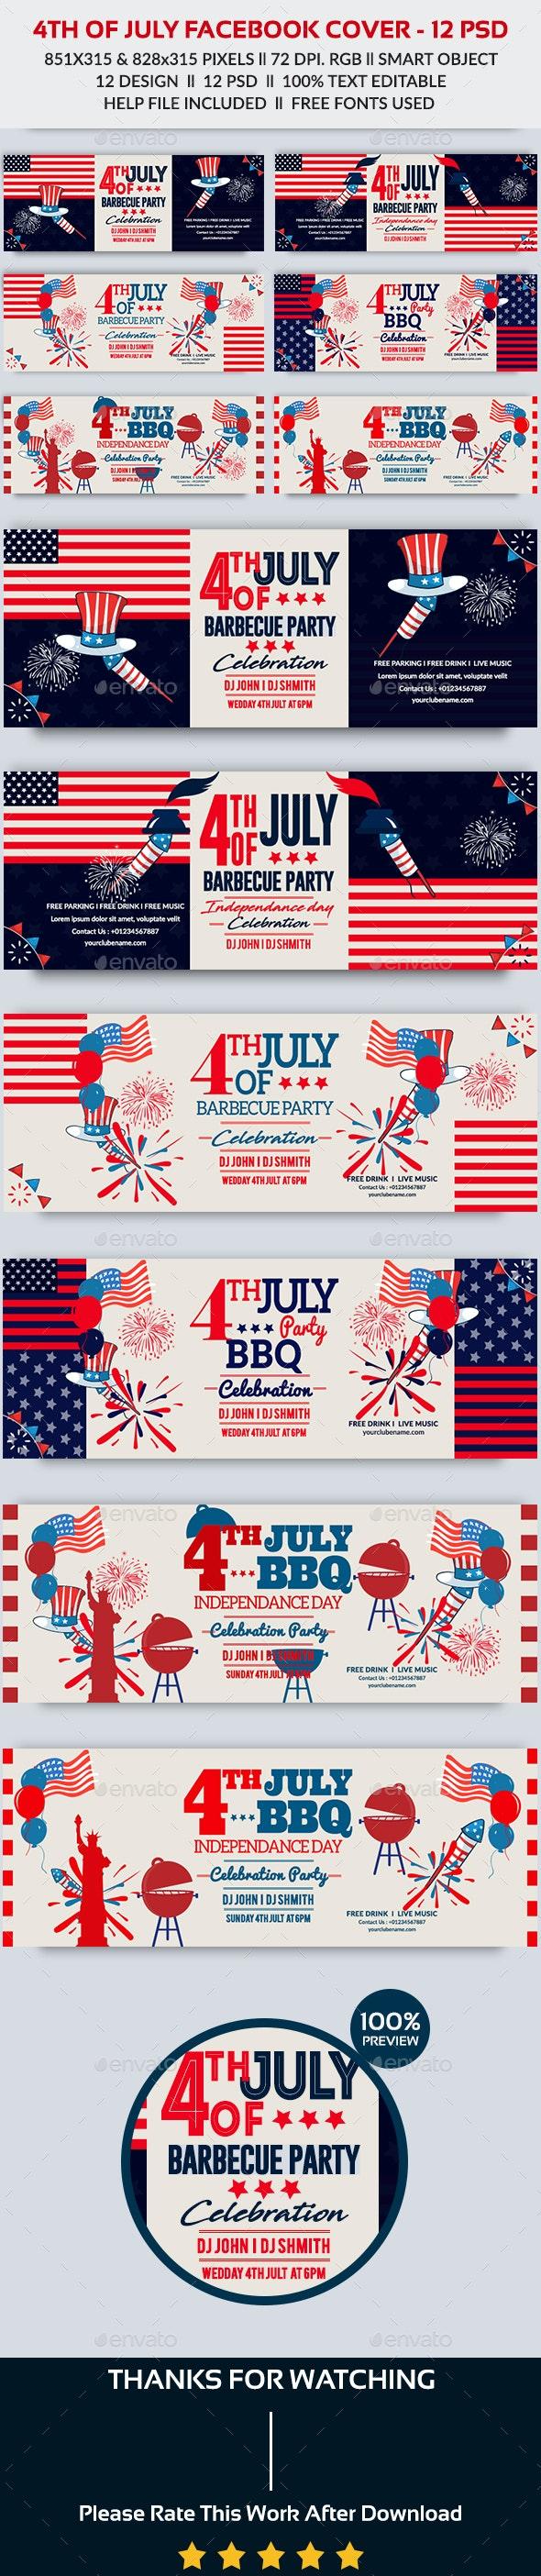 4th of July Facebook Cover-Bundle-12 PSD - Facebook Timeline Covers Social Media